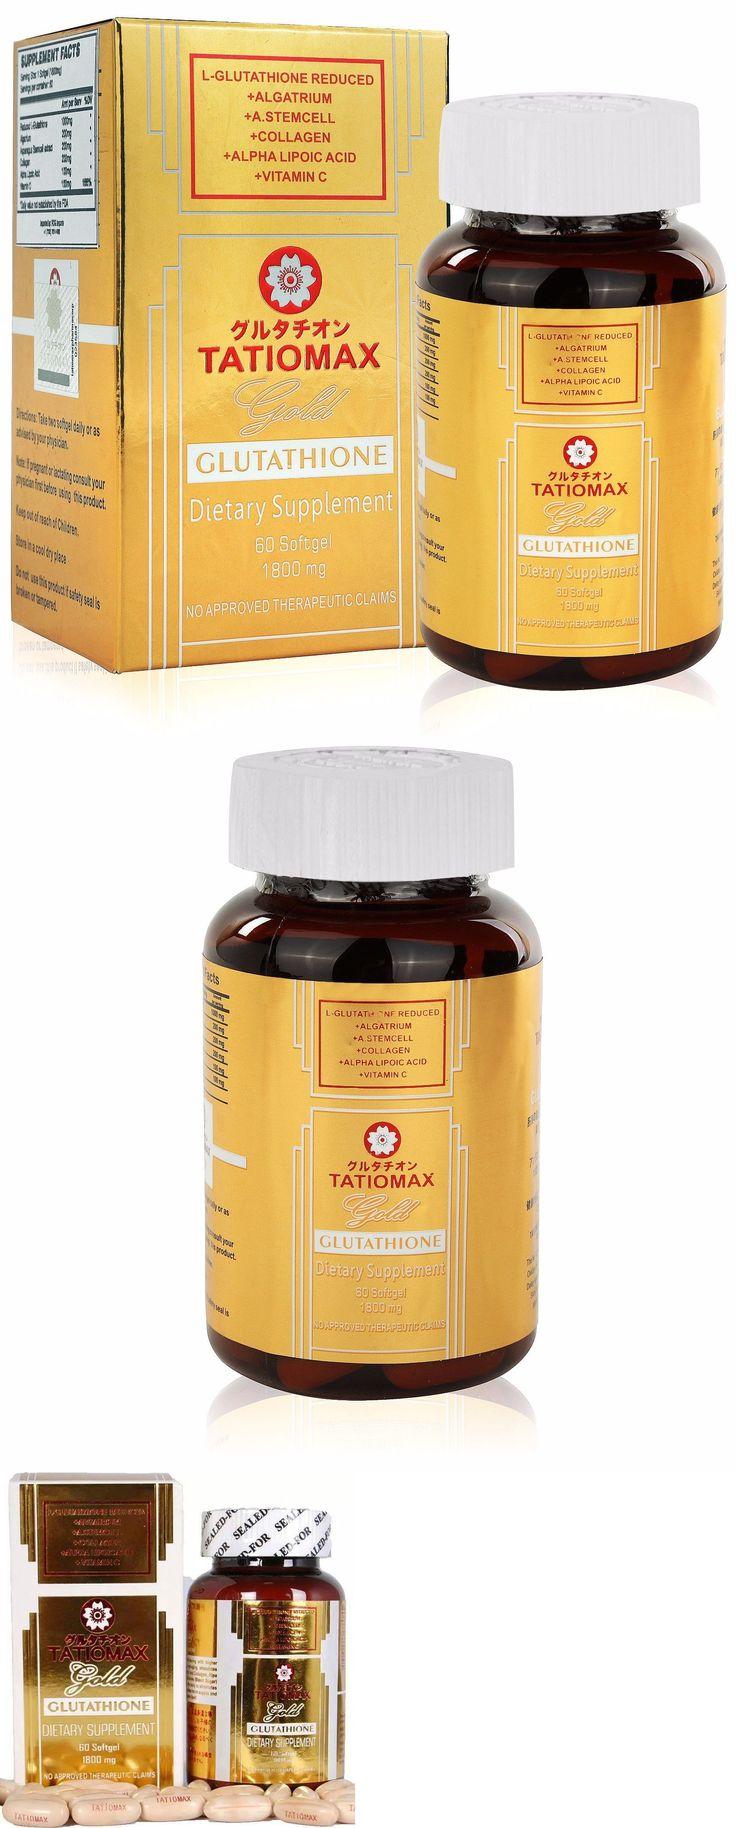 Lightening Cream: New Tatiomax Gold Glutathione Whitening Gel Capsules With 1800Mg Of Glutathione -> BUY IT NOW ONLY: $74.5 on eBay!